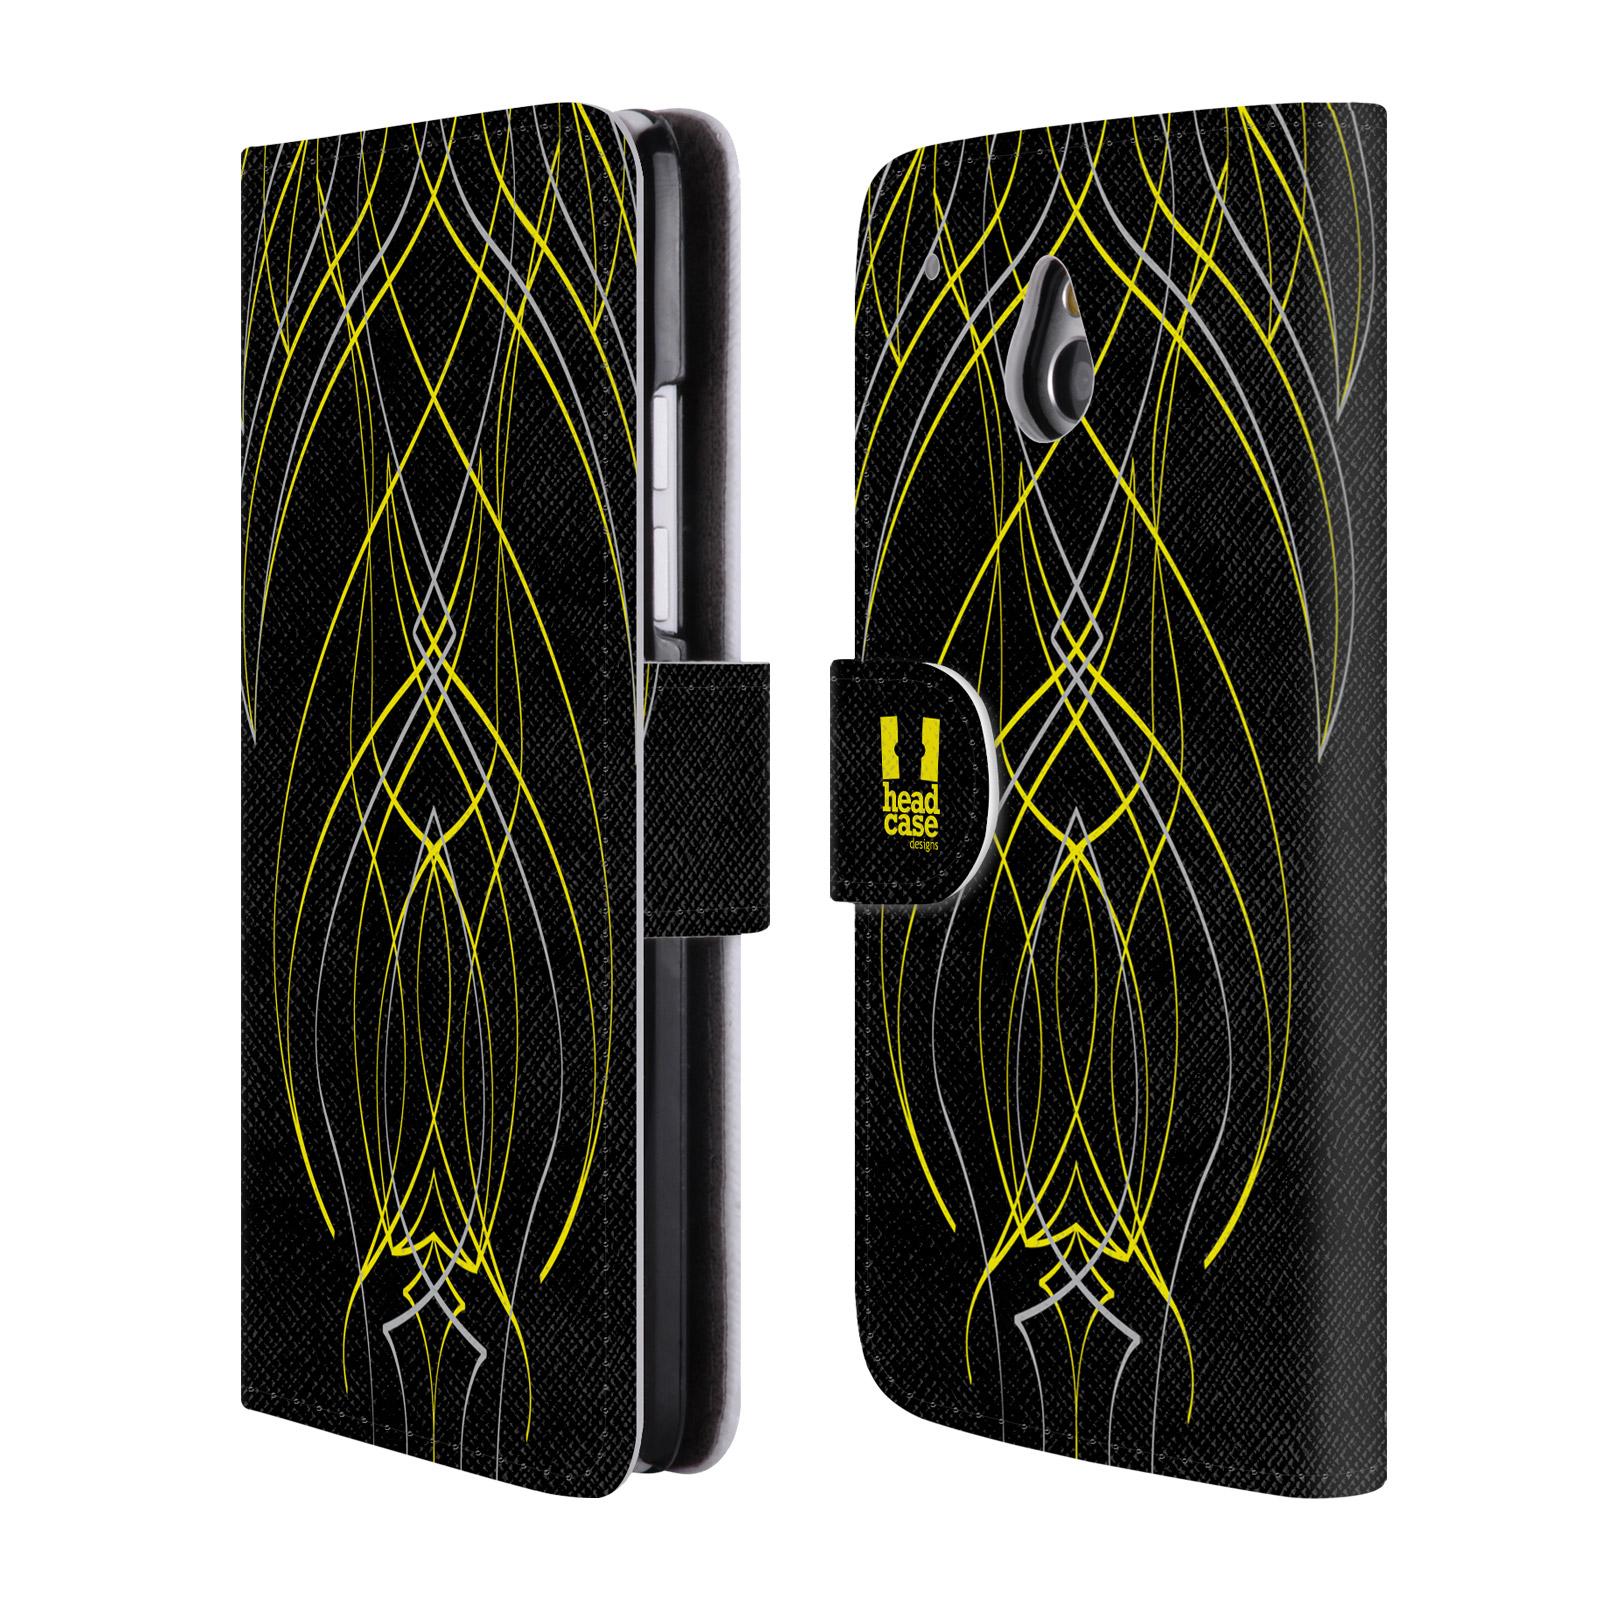 HEAD CASE Flipové pouzdro pro mobil HTC ONE MINI (M4) barevné proužky tvary žlutá